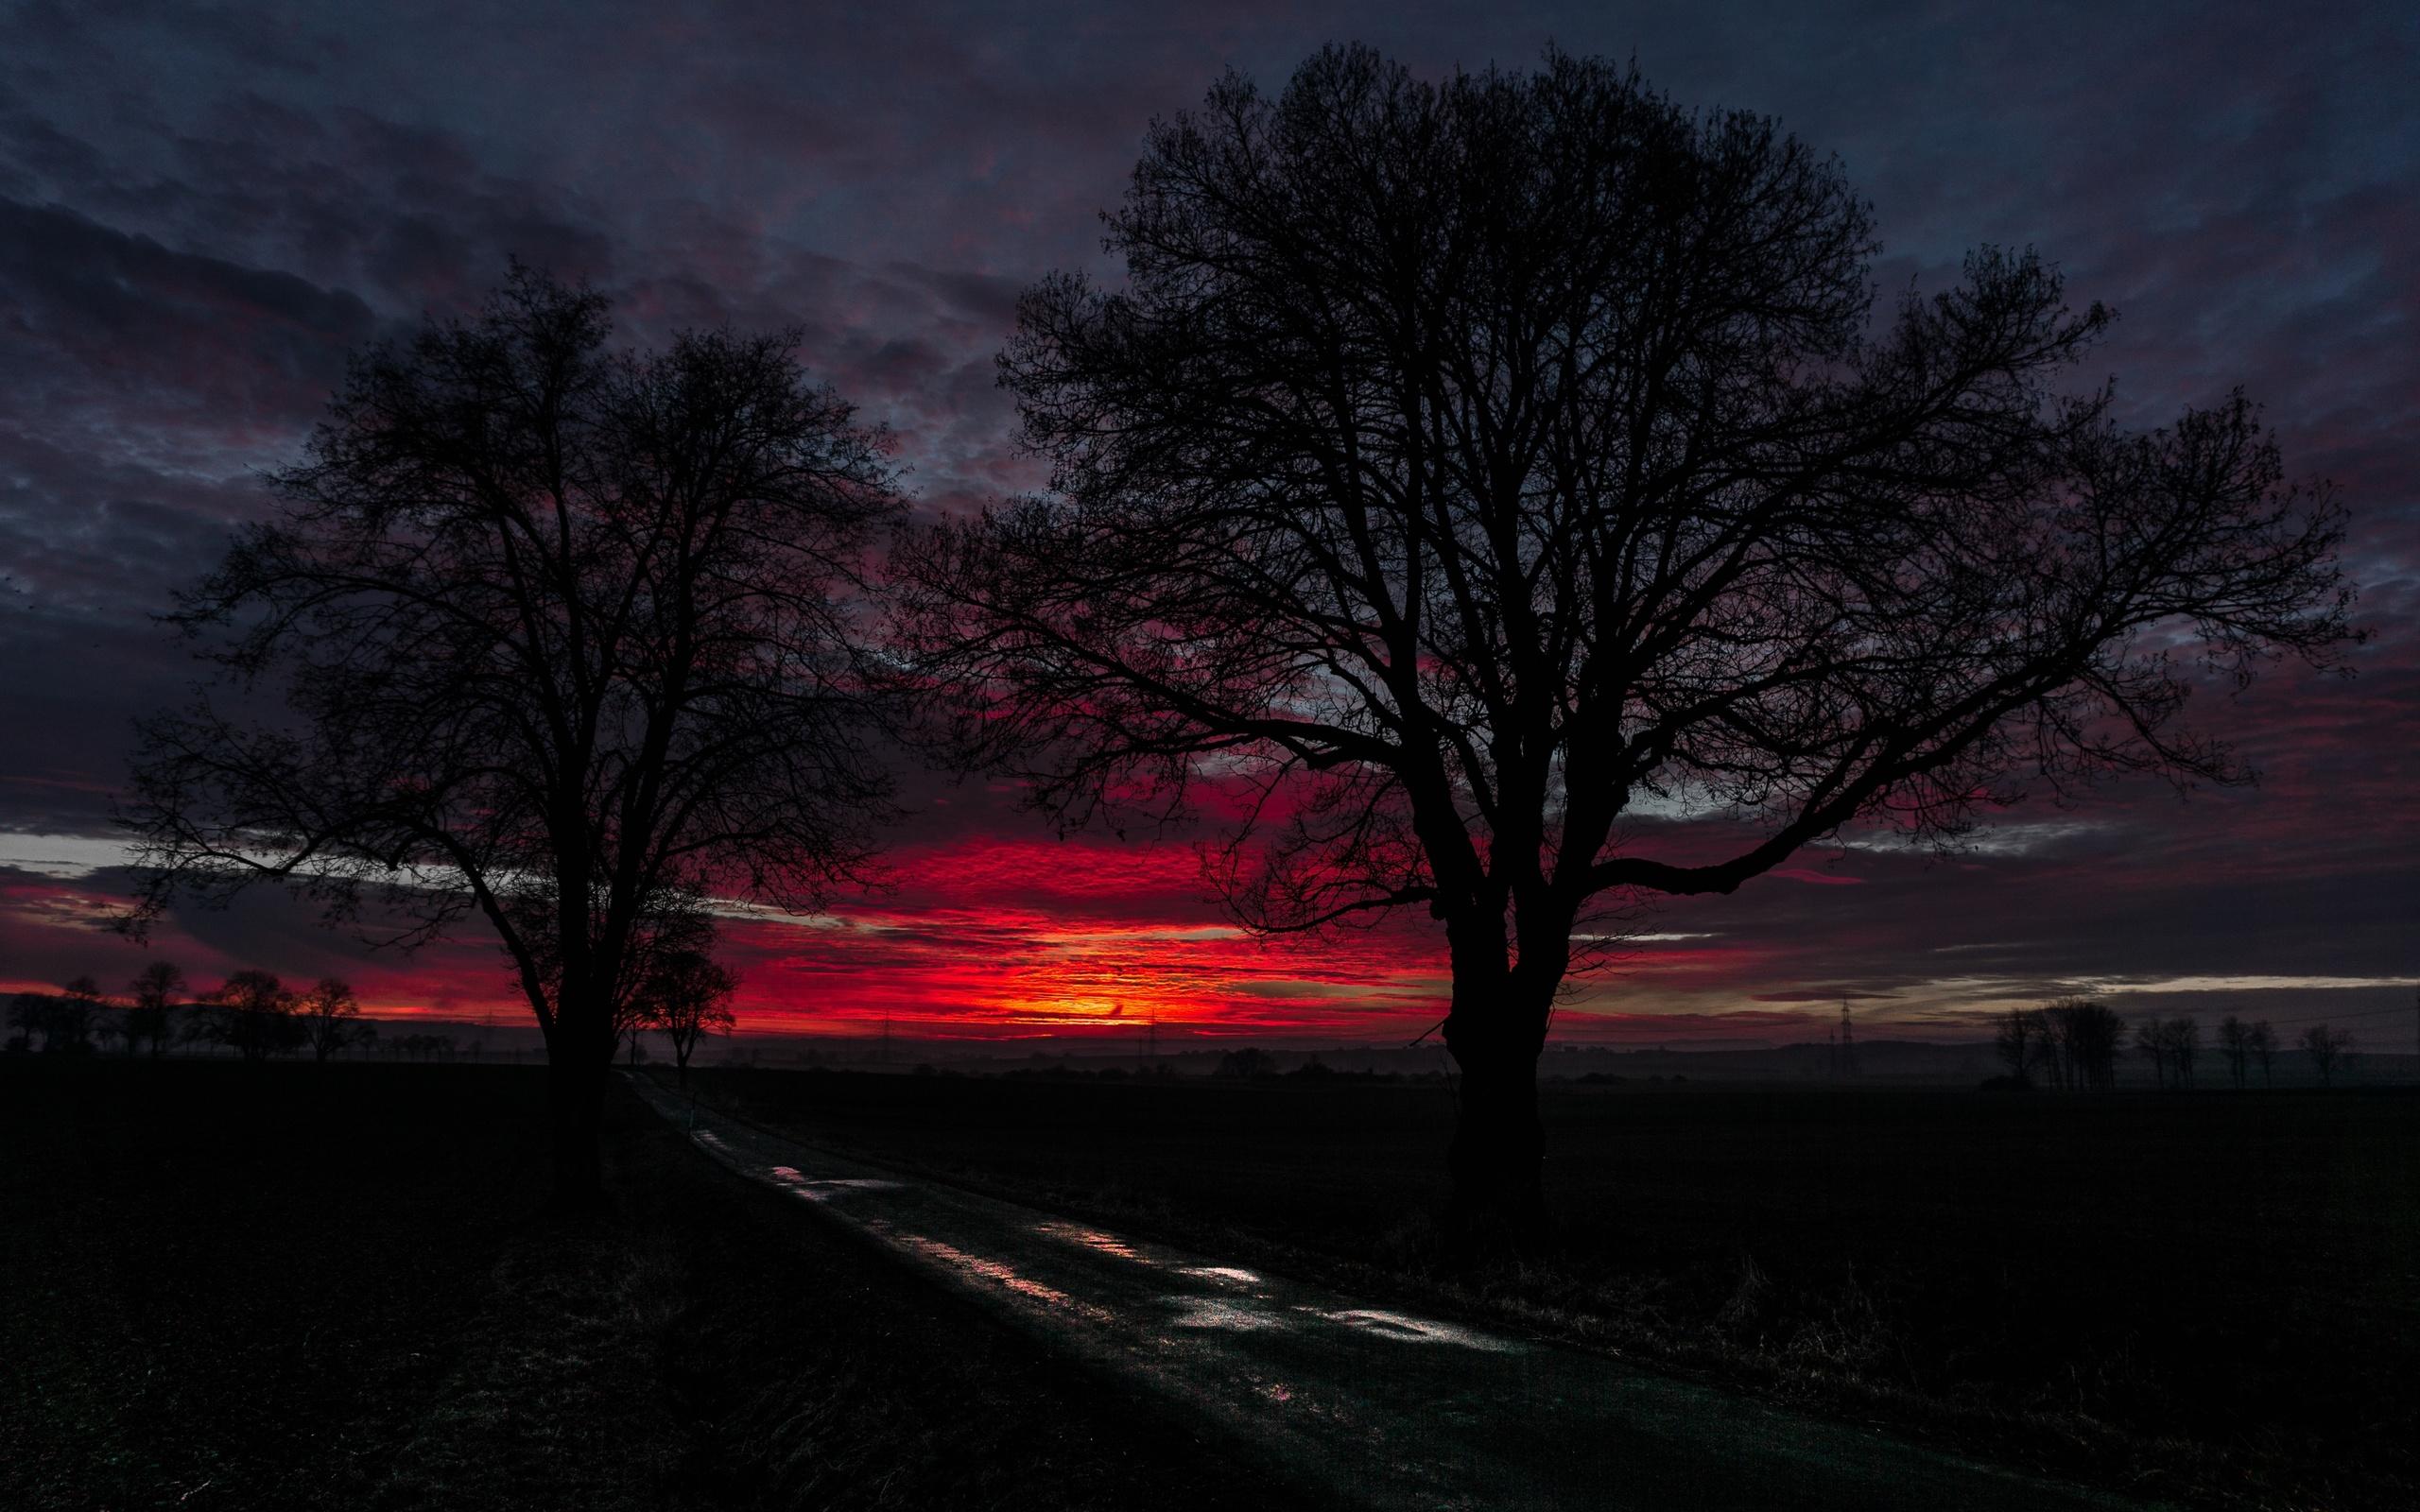 закат, облака, деревья, дорога, горизонт